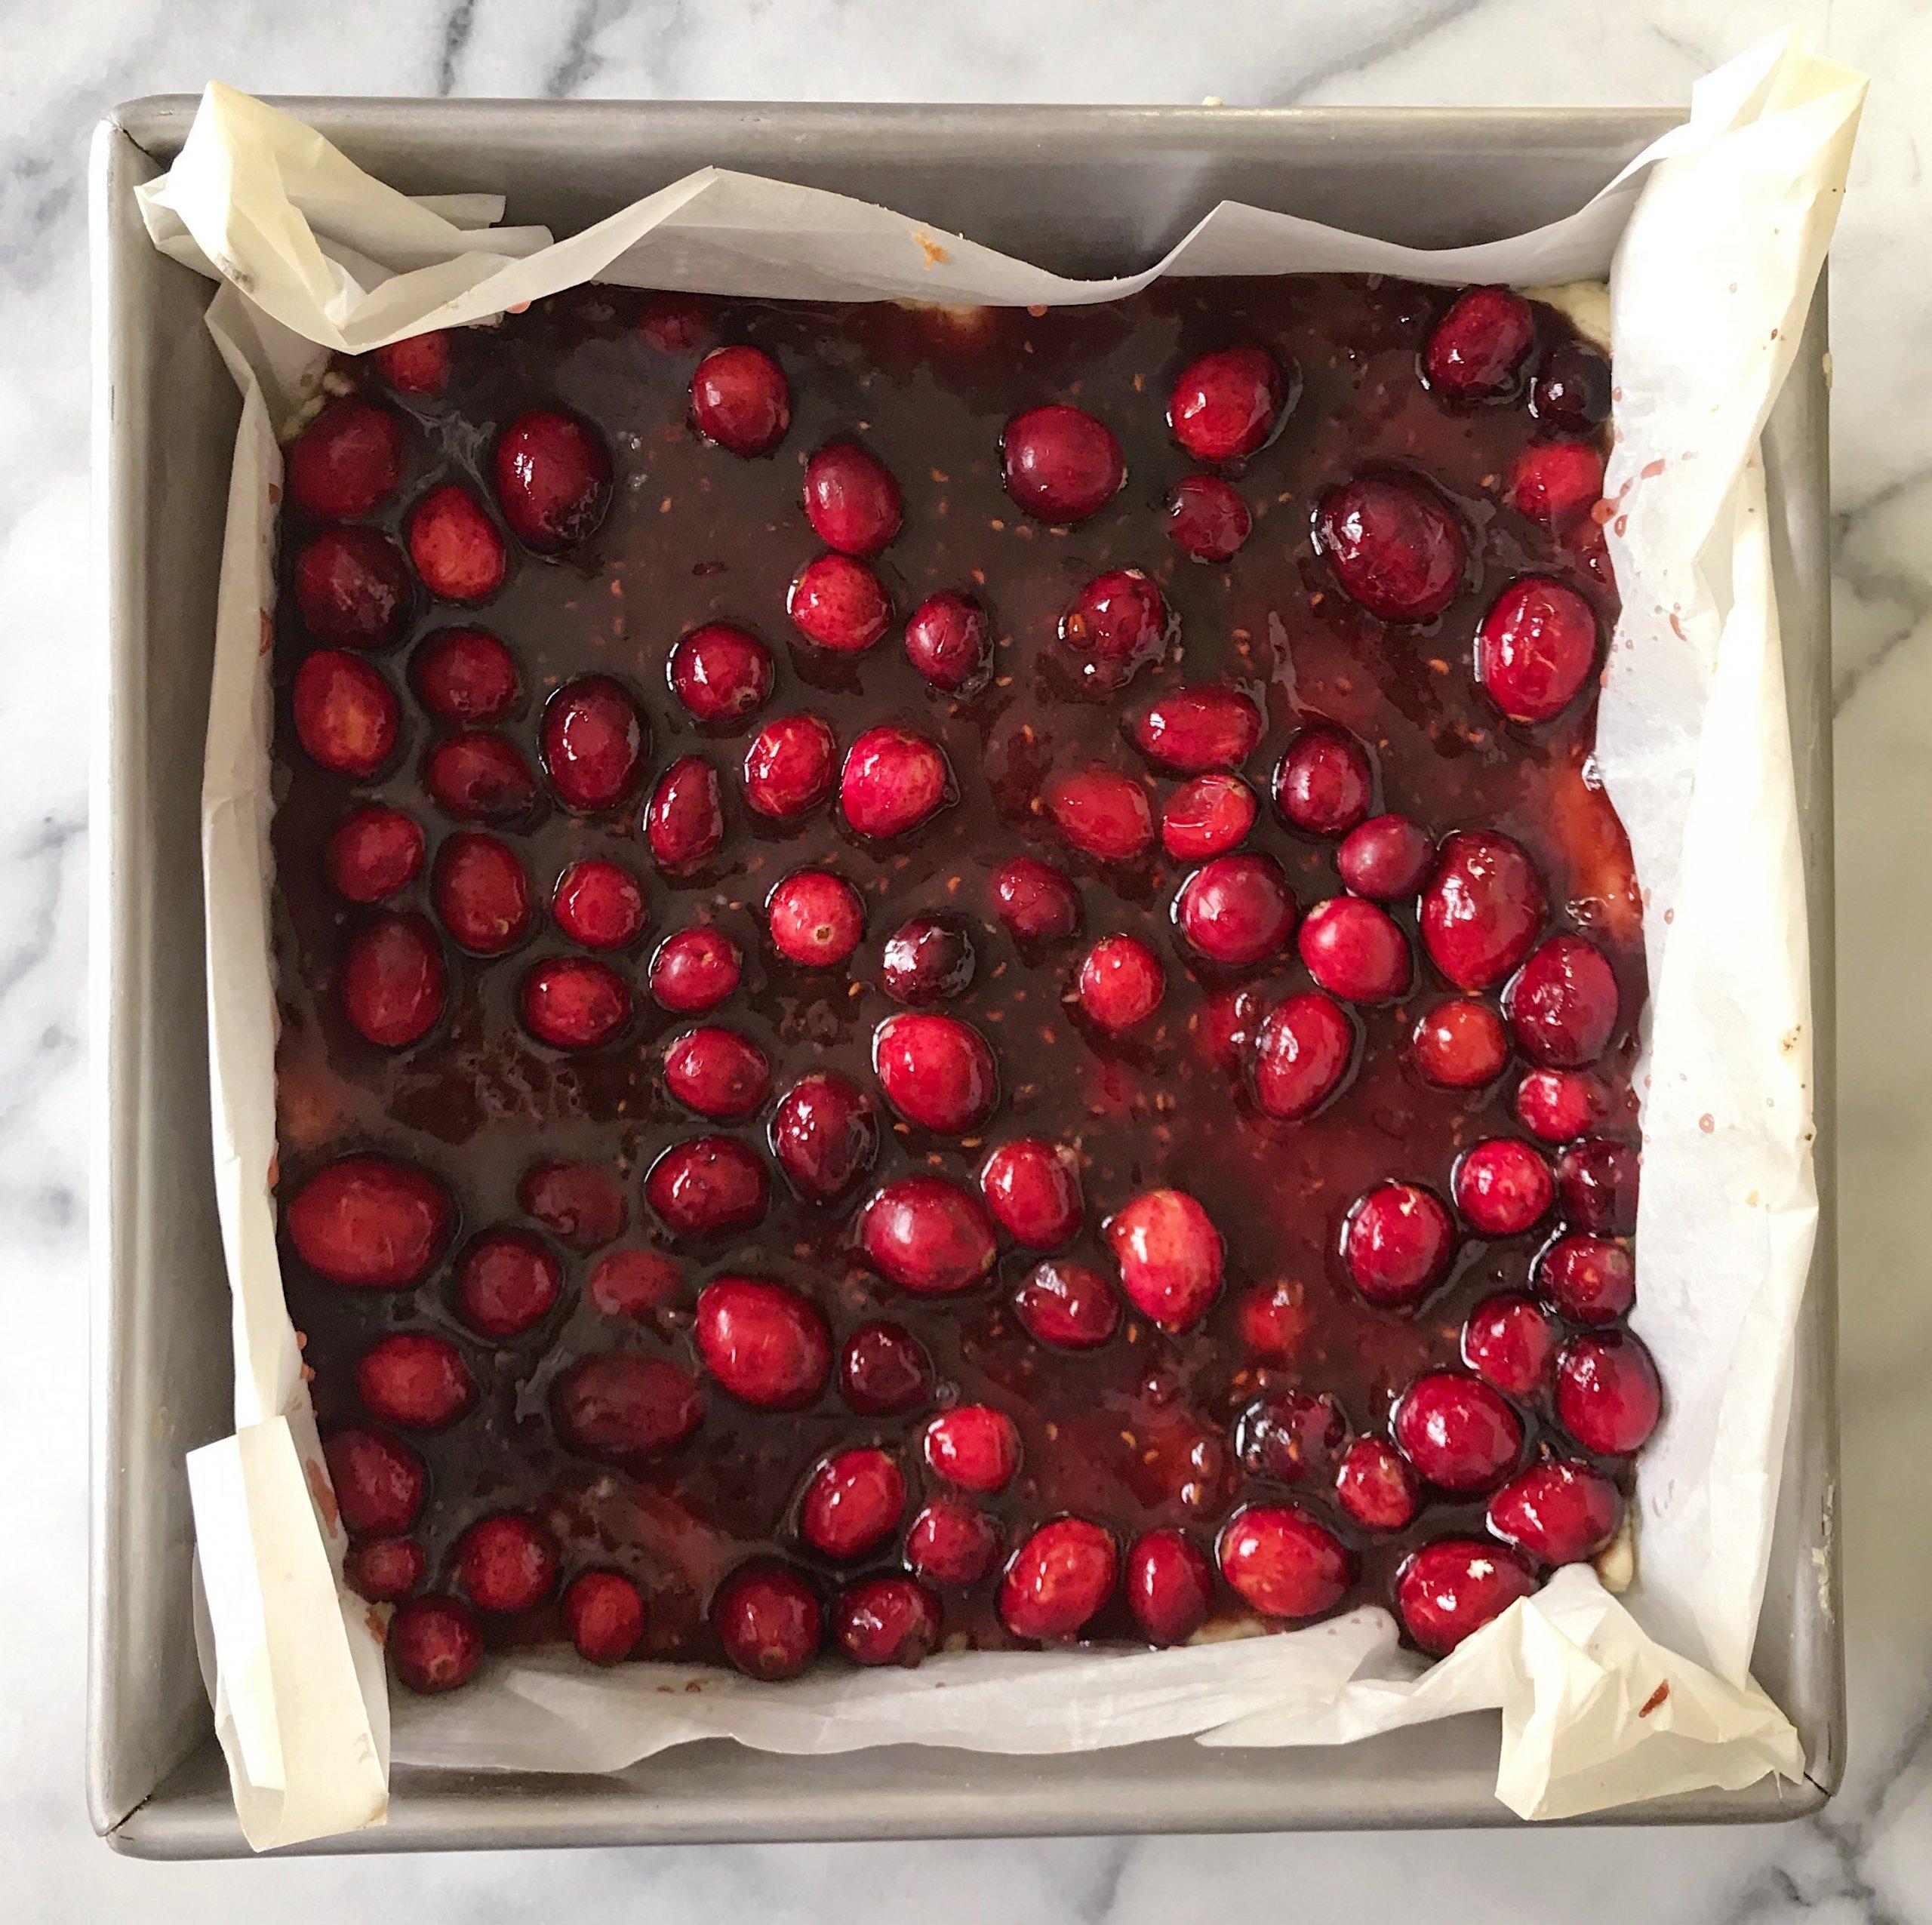 Cranberry Crumble Bars gluten free christmas cookies #glutenfreerecipes www.healthygffamily.com